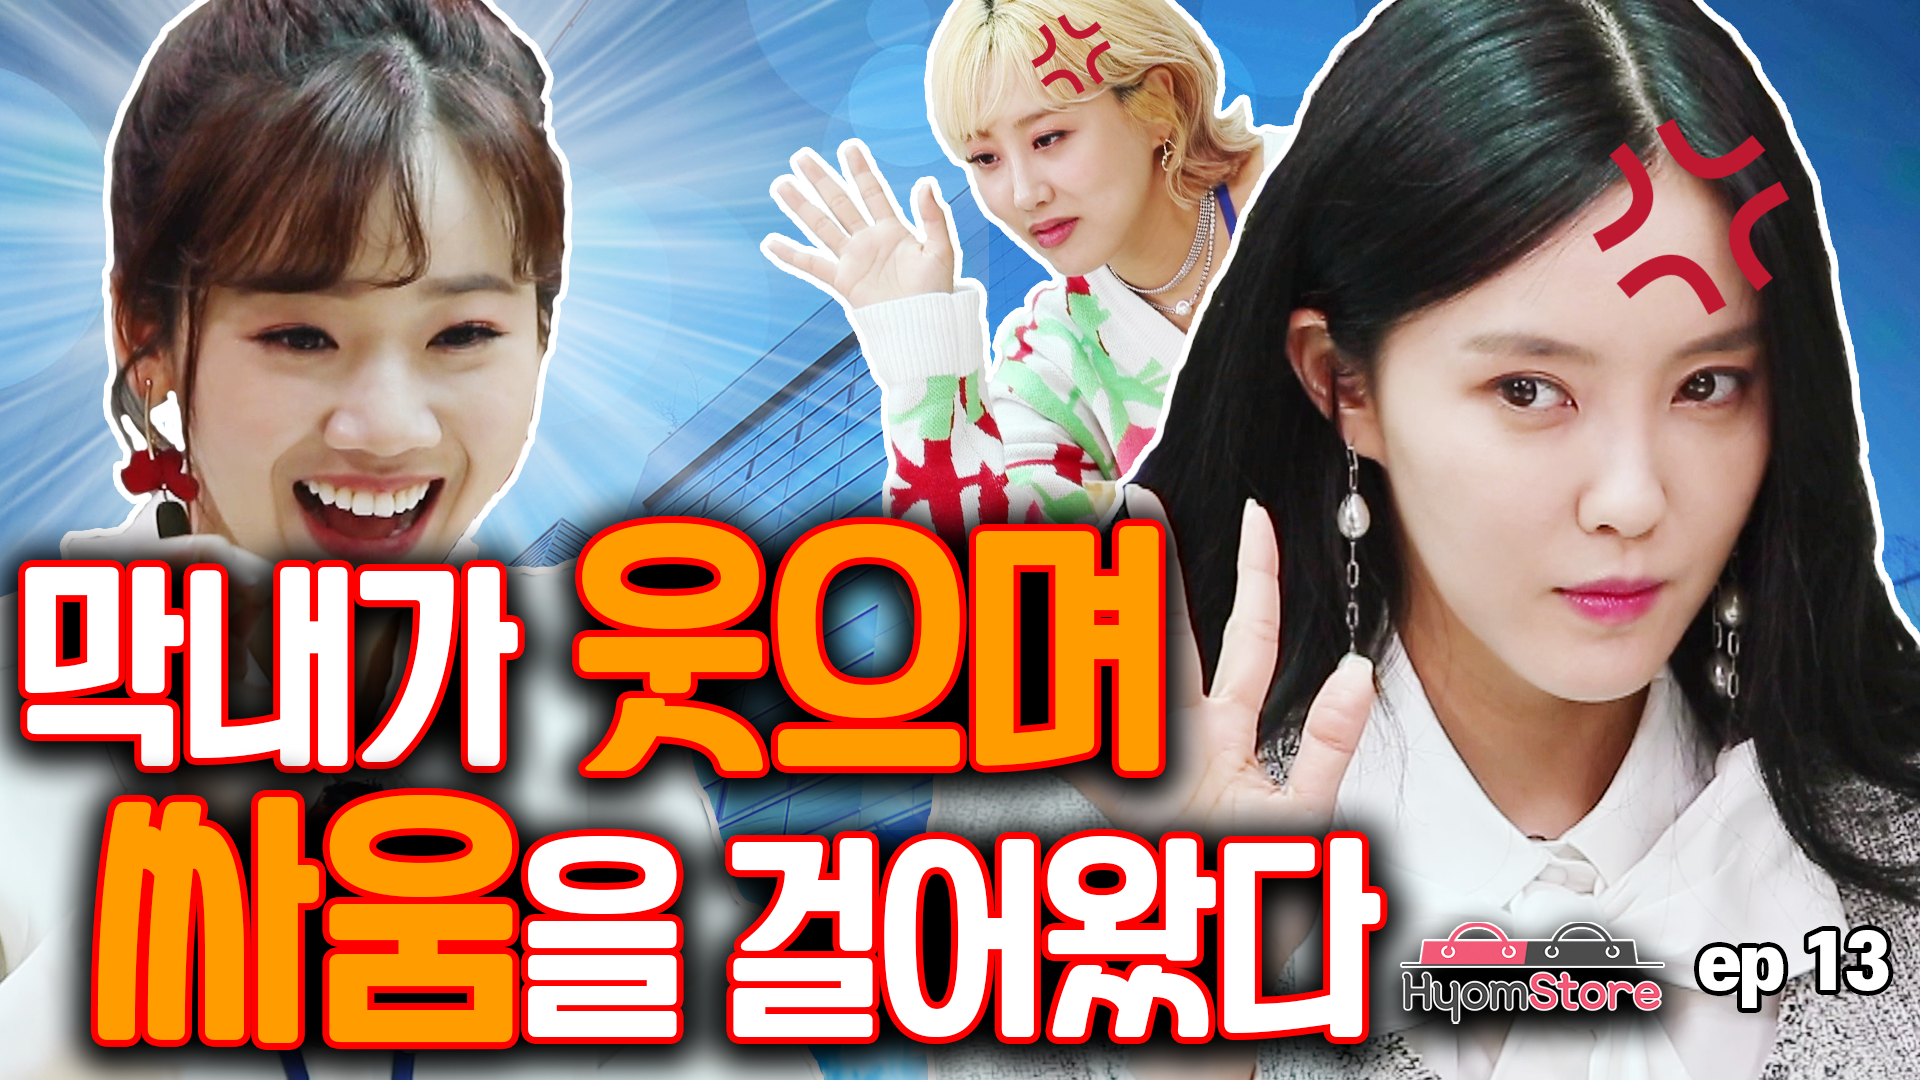 ep13. 자신감 넘치는 MD들의 프레젠테이션 (feat.메이찬, 피피)